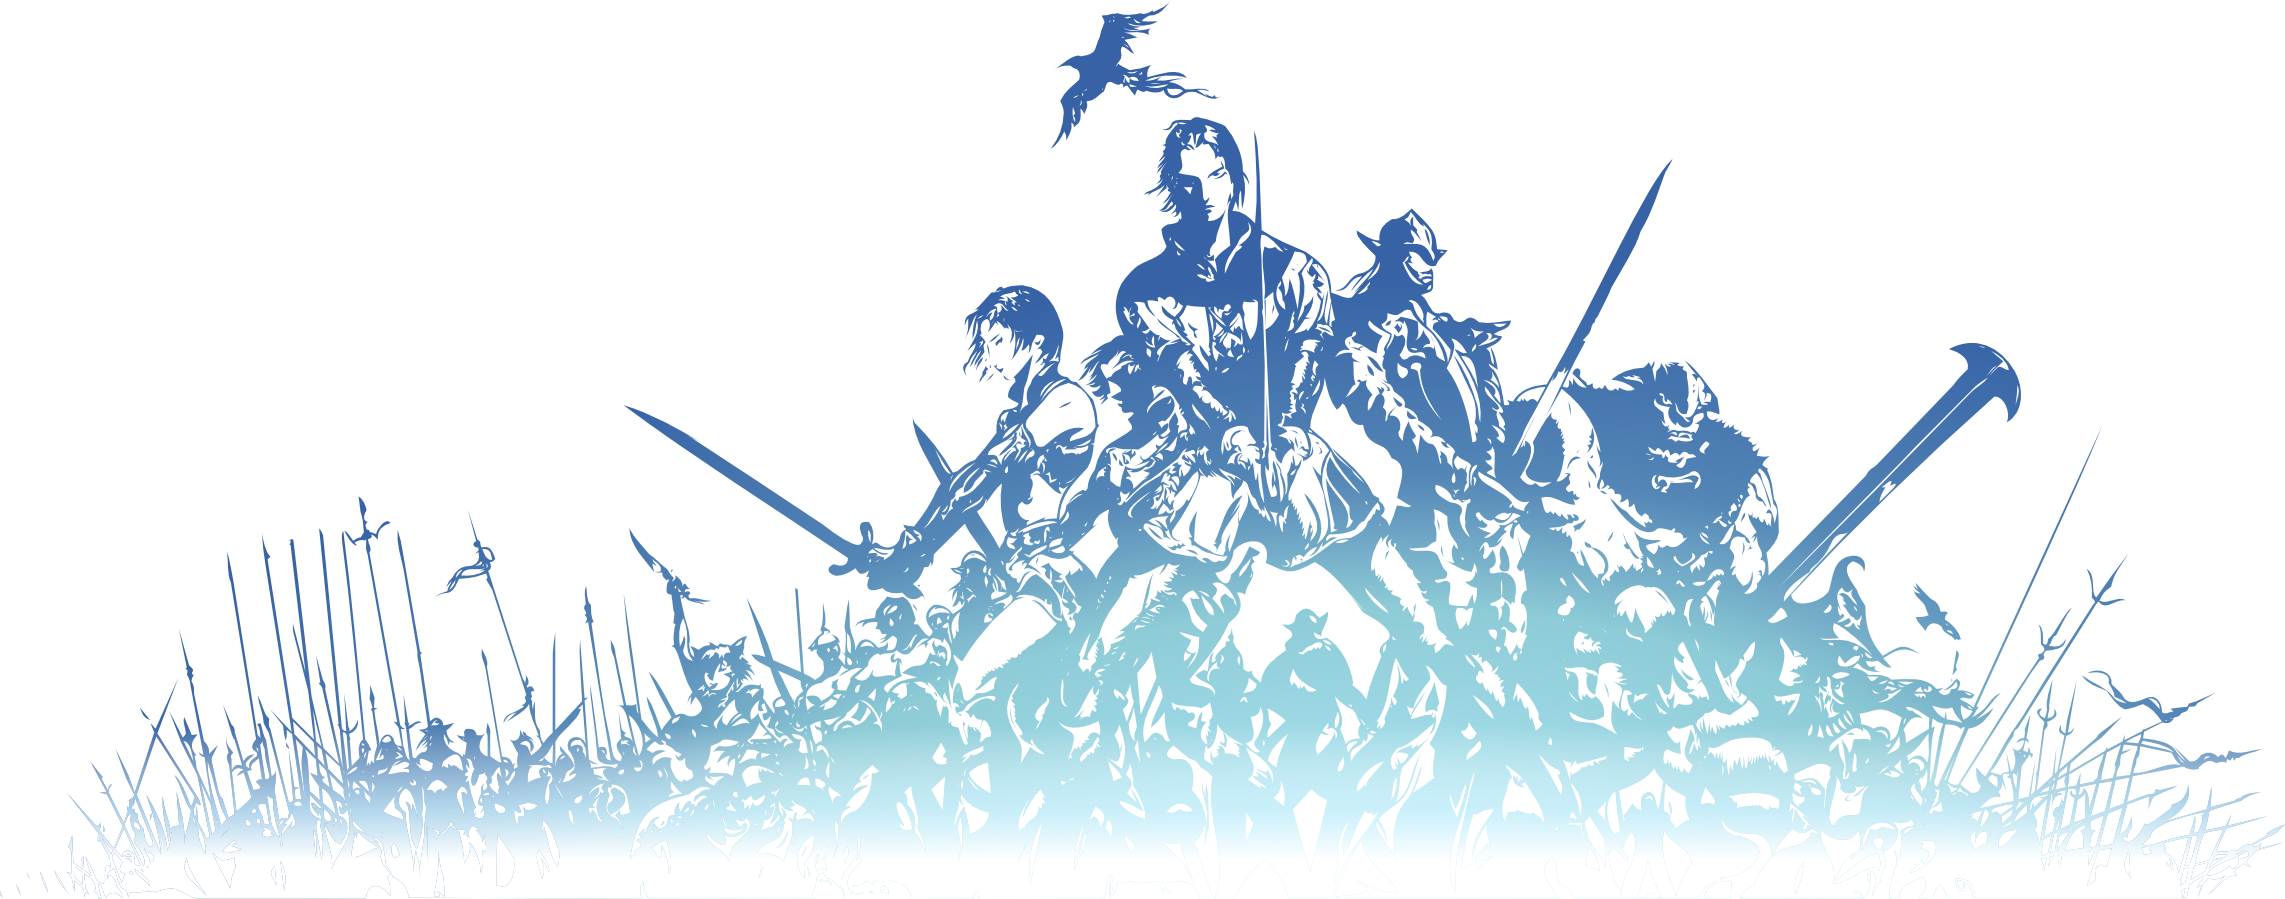 Final fantasy xii logo png - photo#35